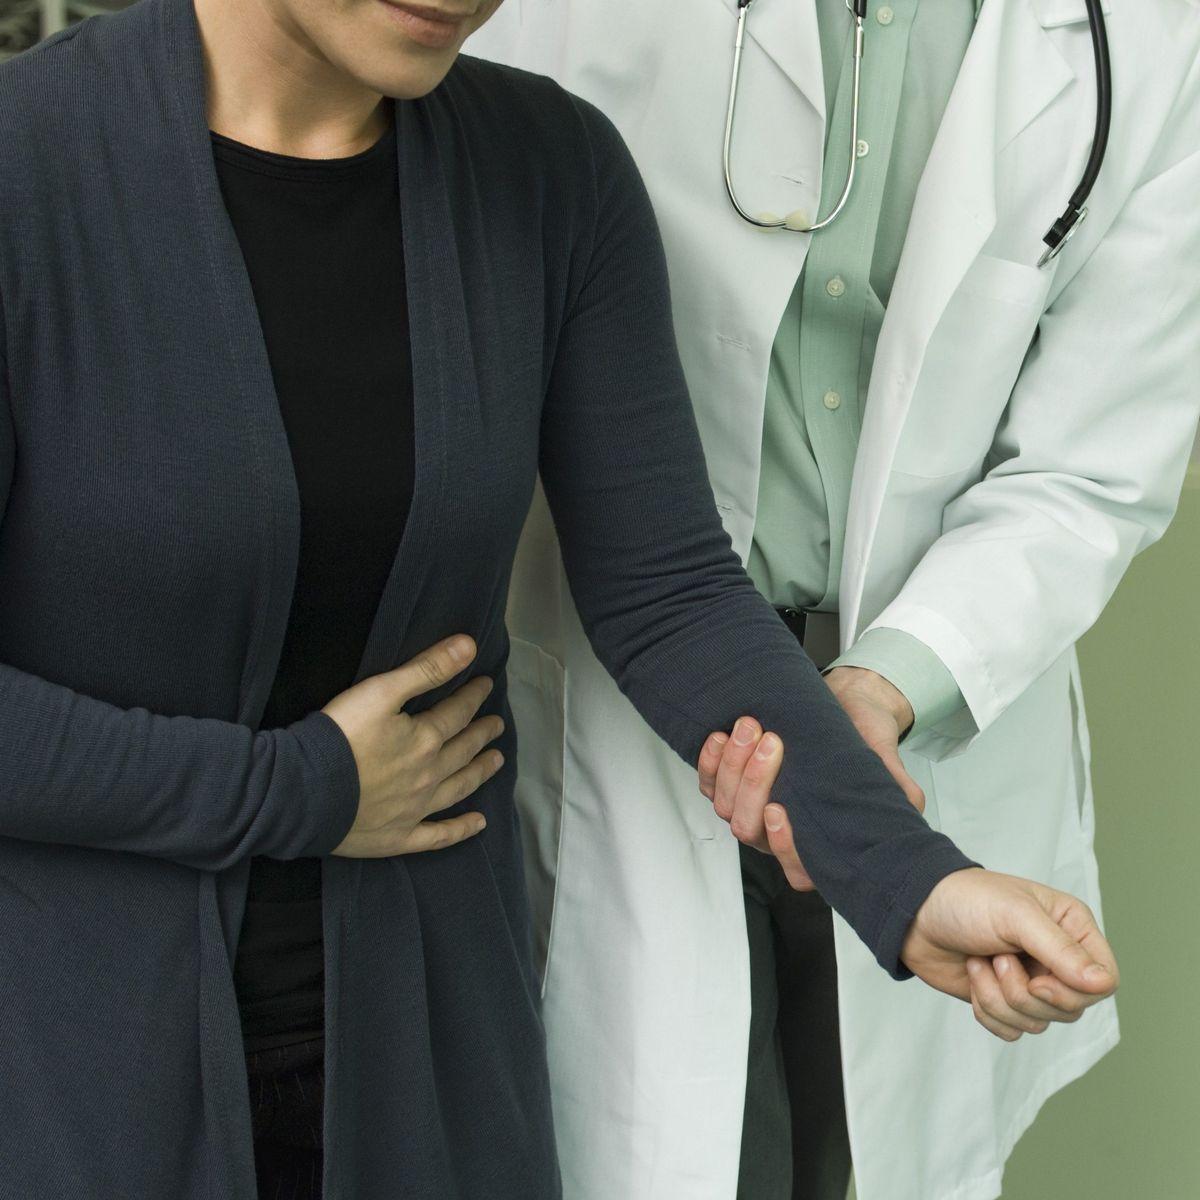 eierstock verdreht symptome